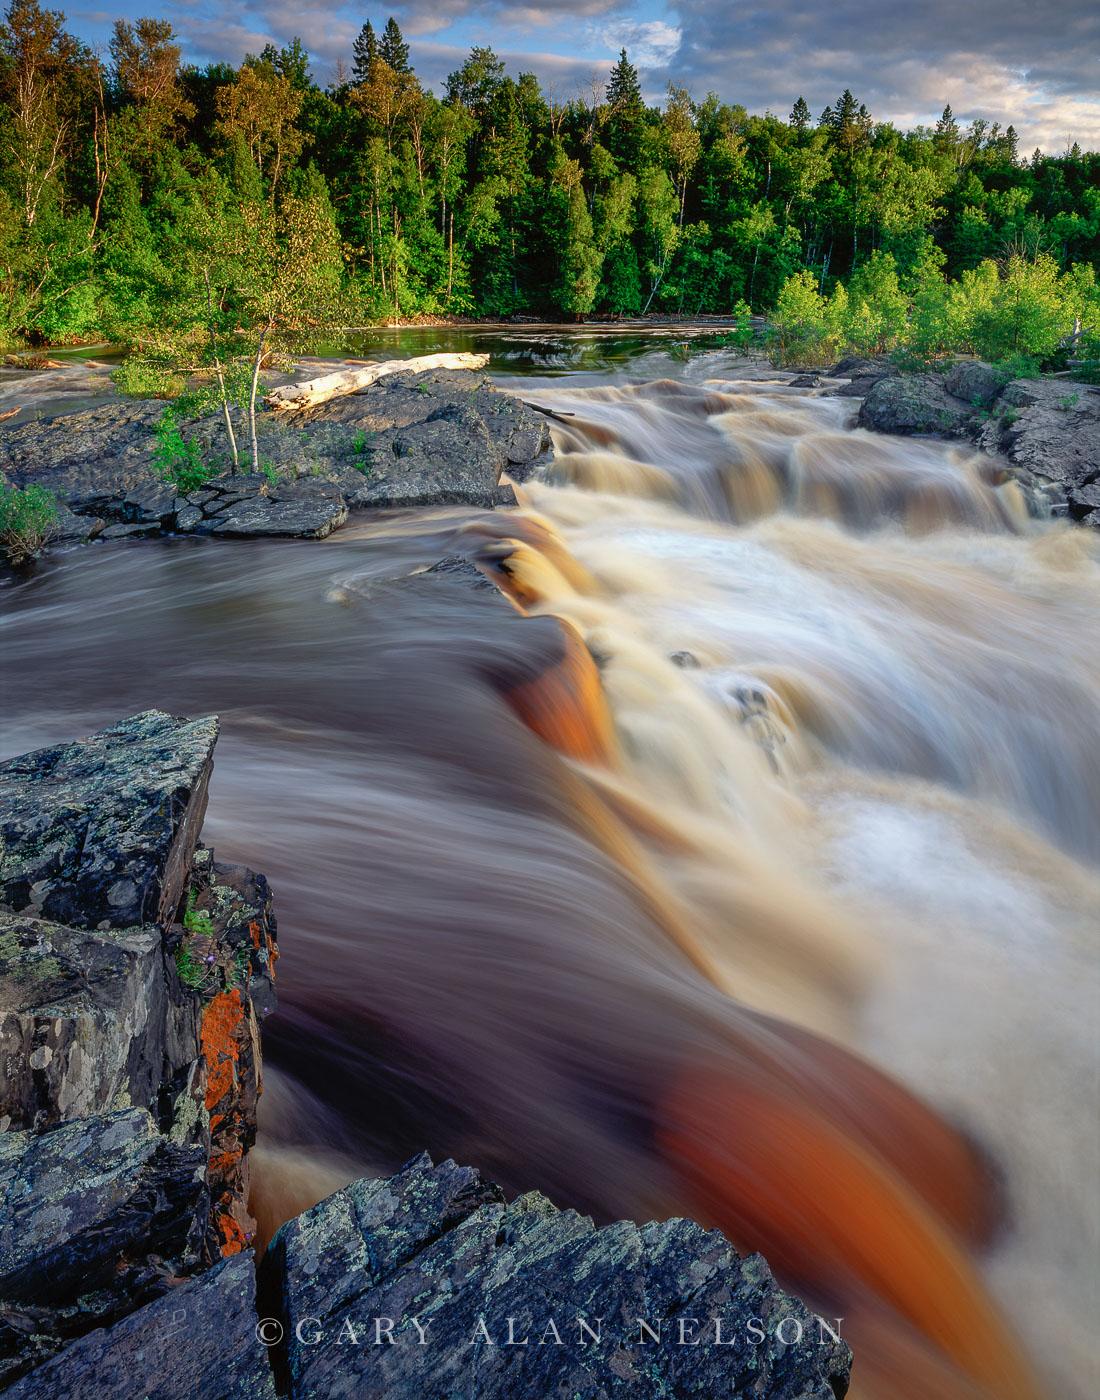 st. louis river, rapid, lake superior, jay cooke state park, minnesota, photo